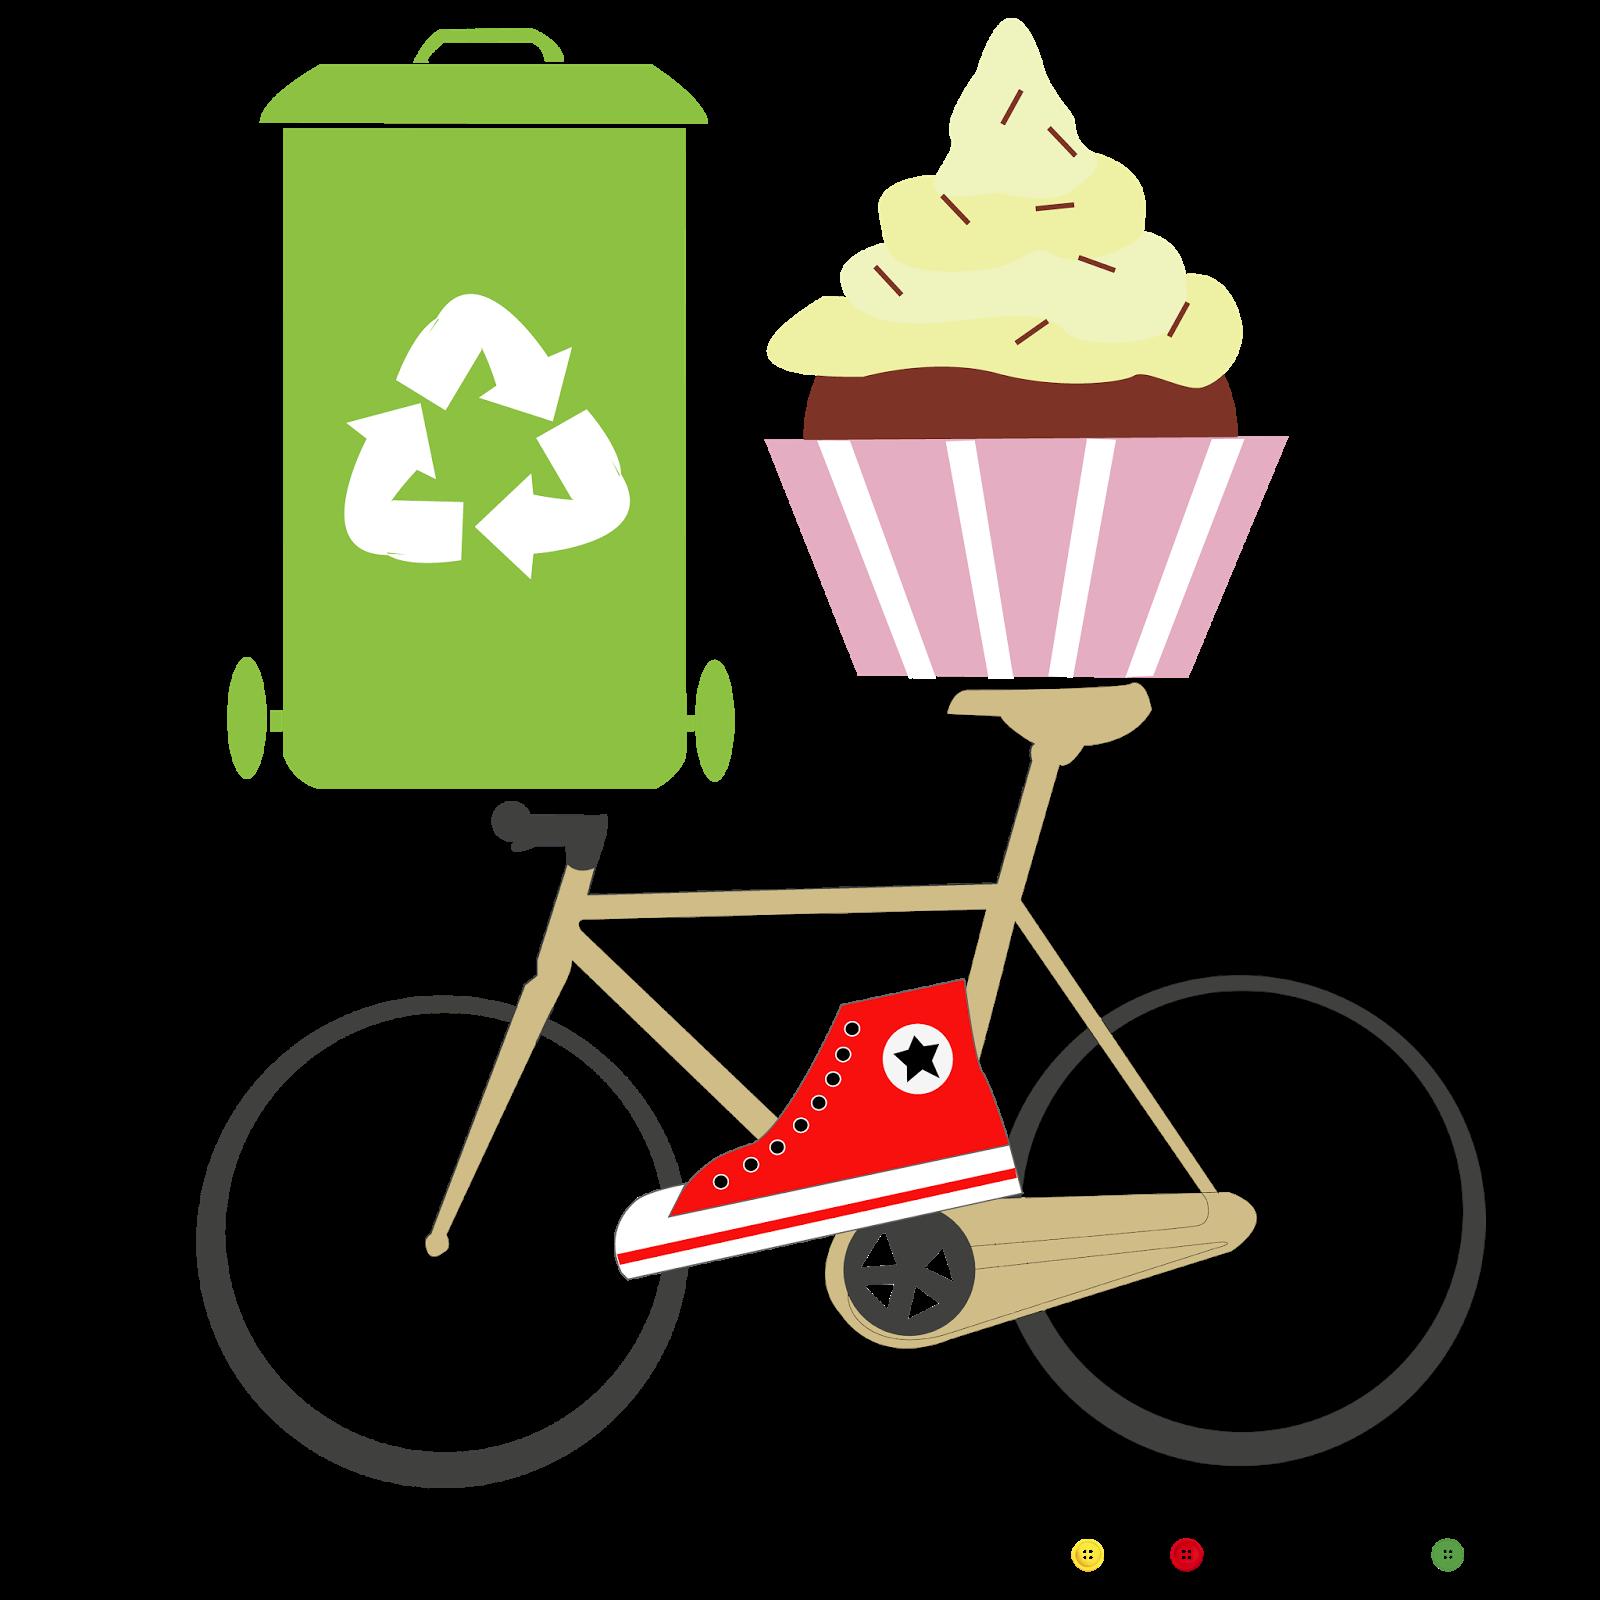 freebies hipster gratis infografia cupcake bicicleta reciclaje ecofriendly converse